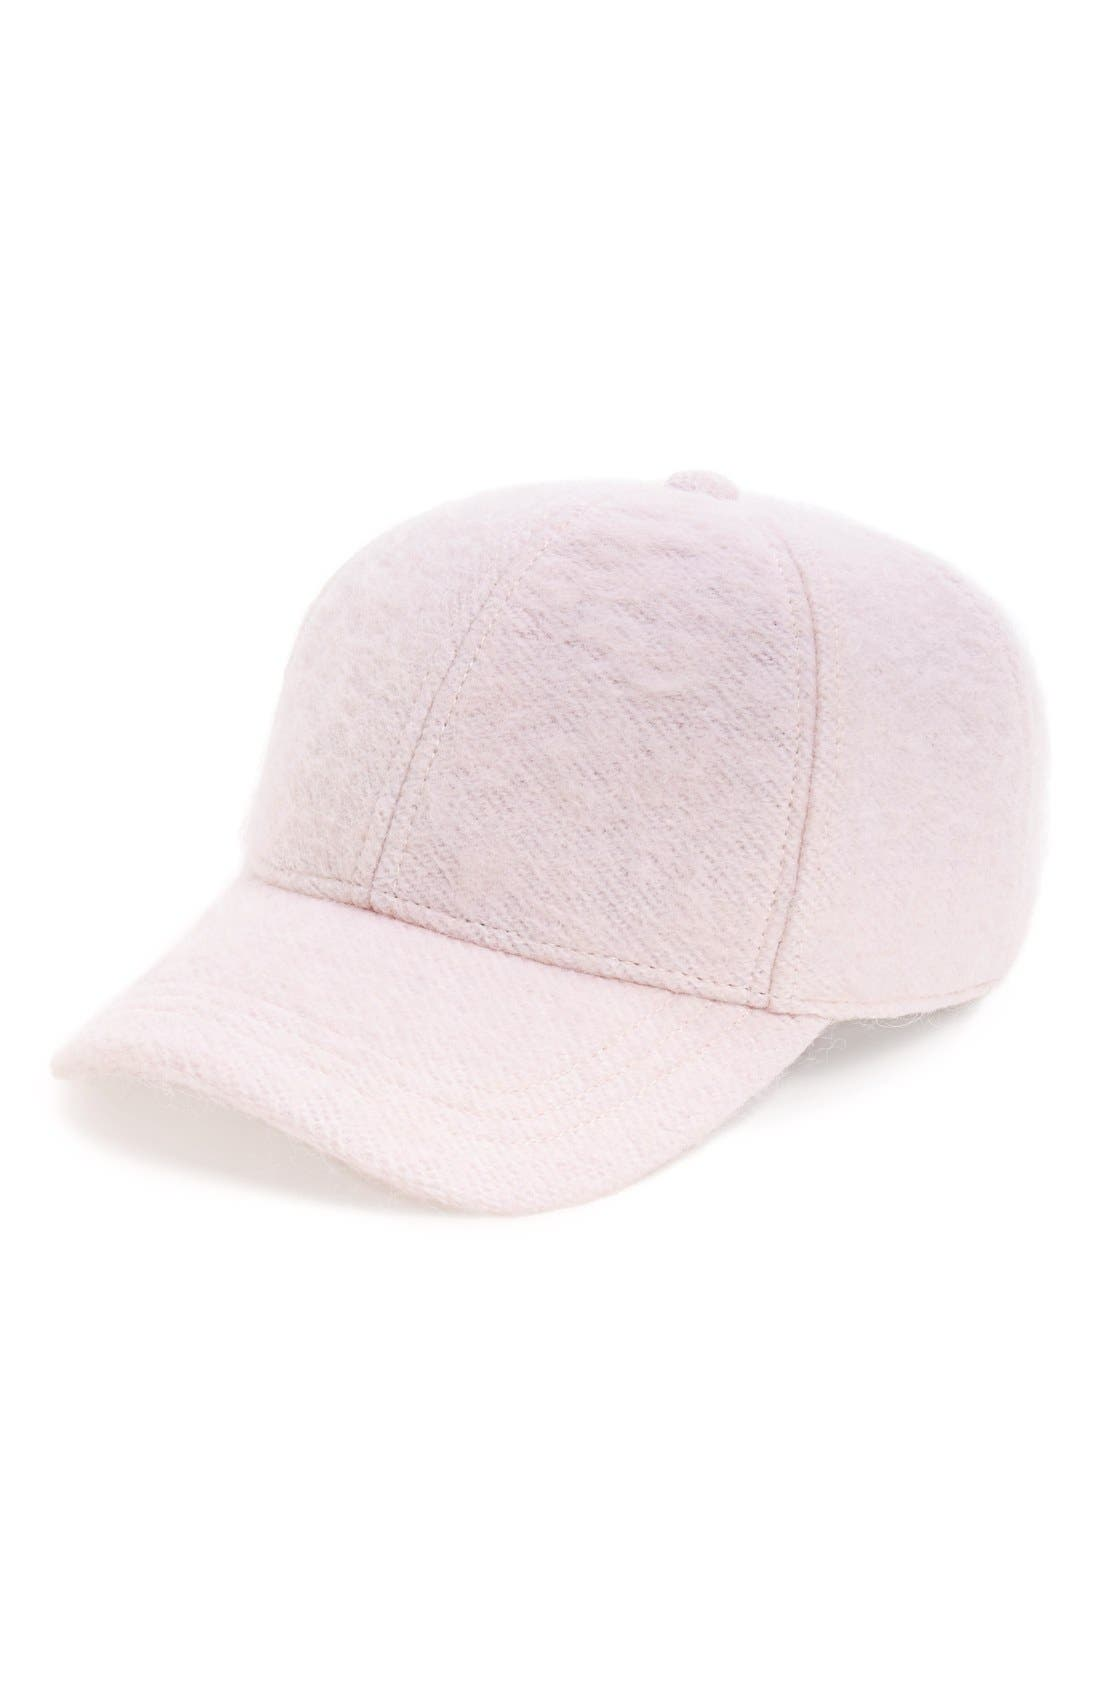 Alternate Image 1 Selected - BP. Wool Blend Baseball Cap